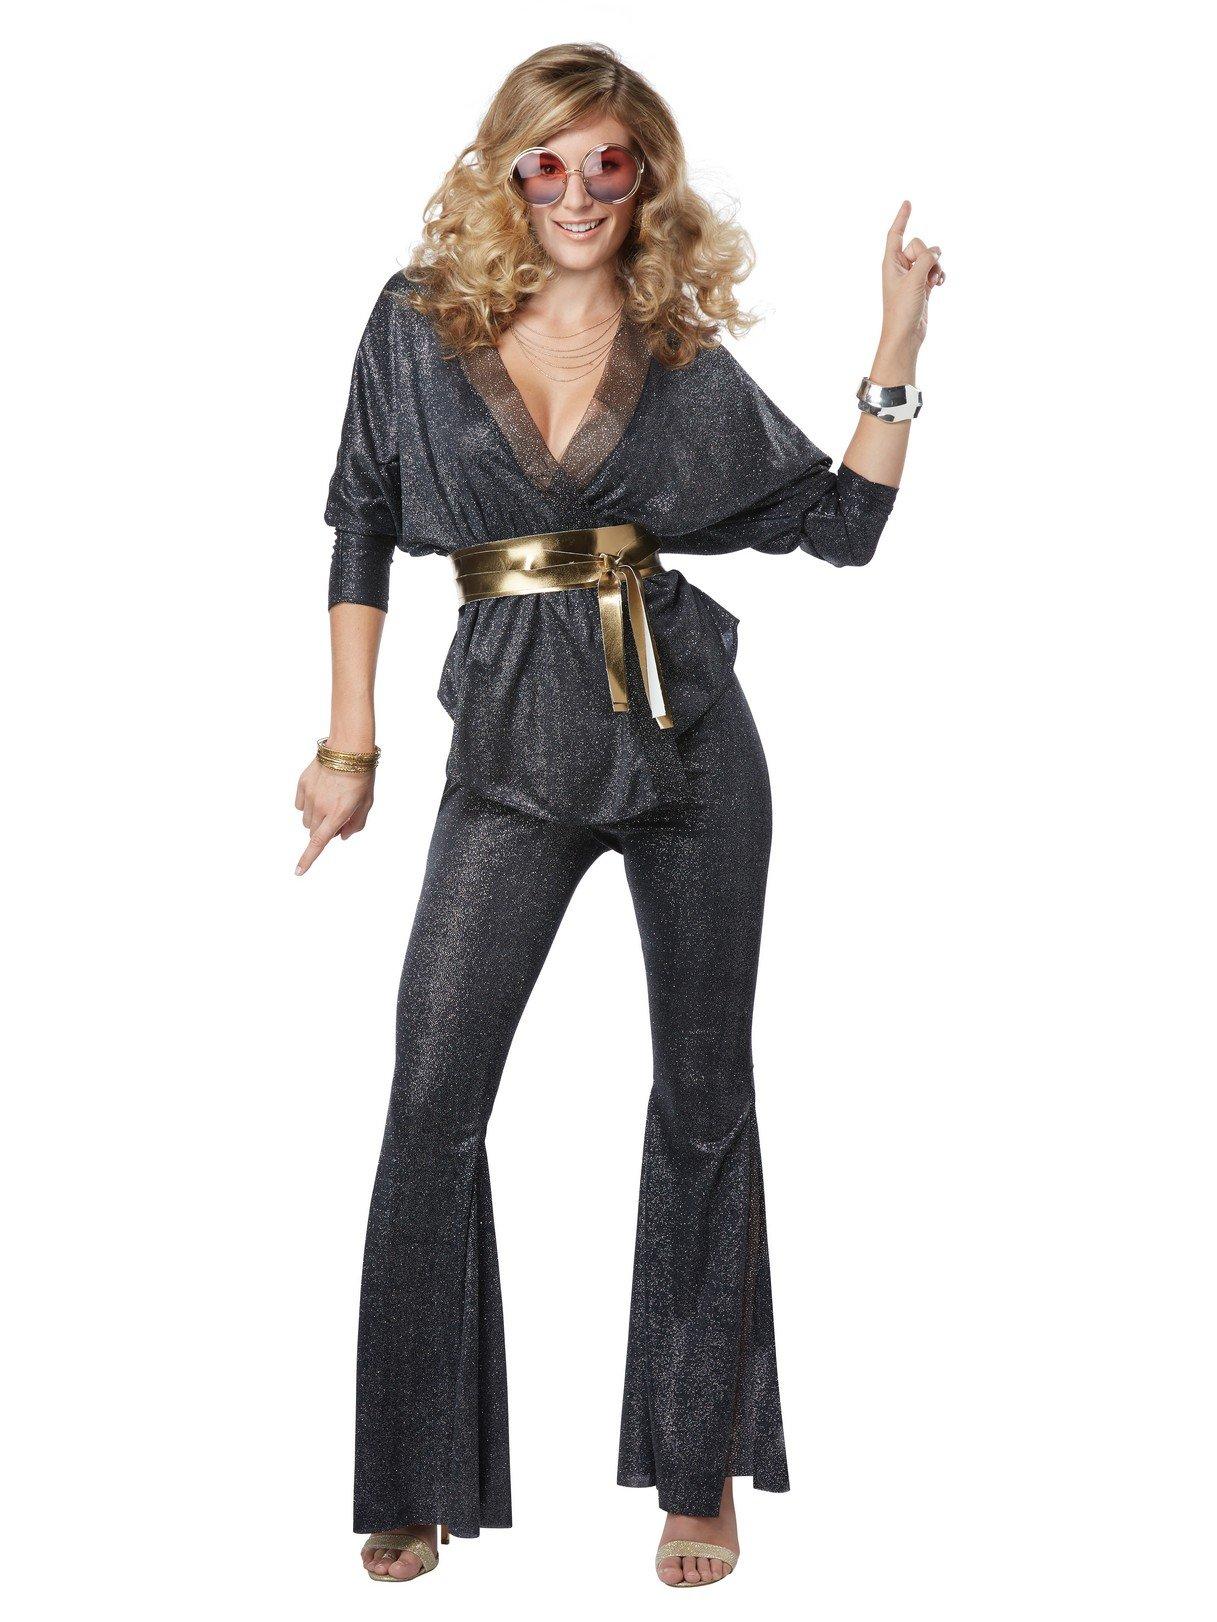 California Costumes Women's Disco Dazzler Adult Woman Costume, Black/Gold, Large